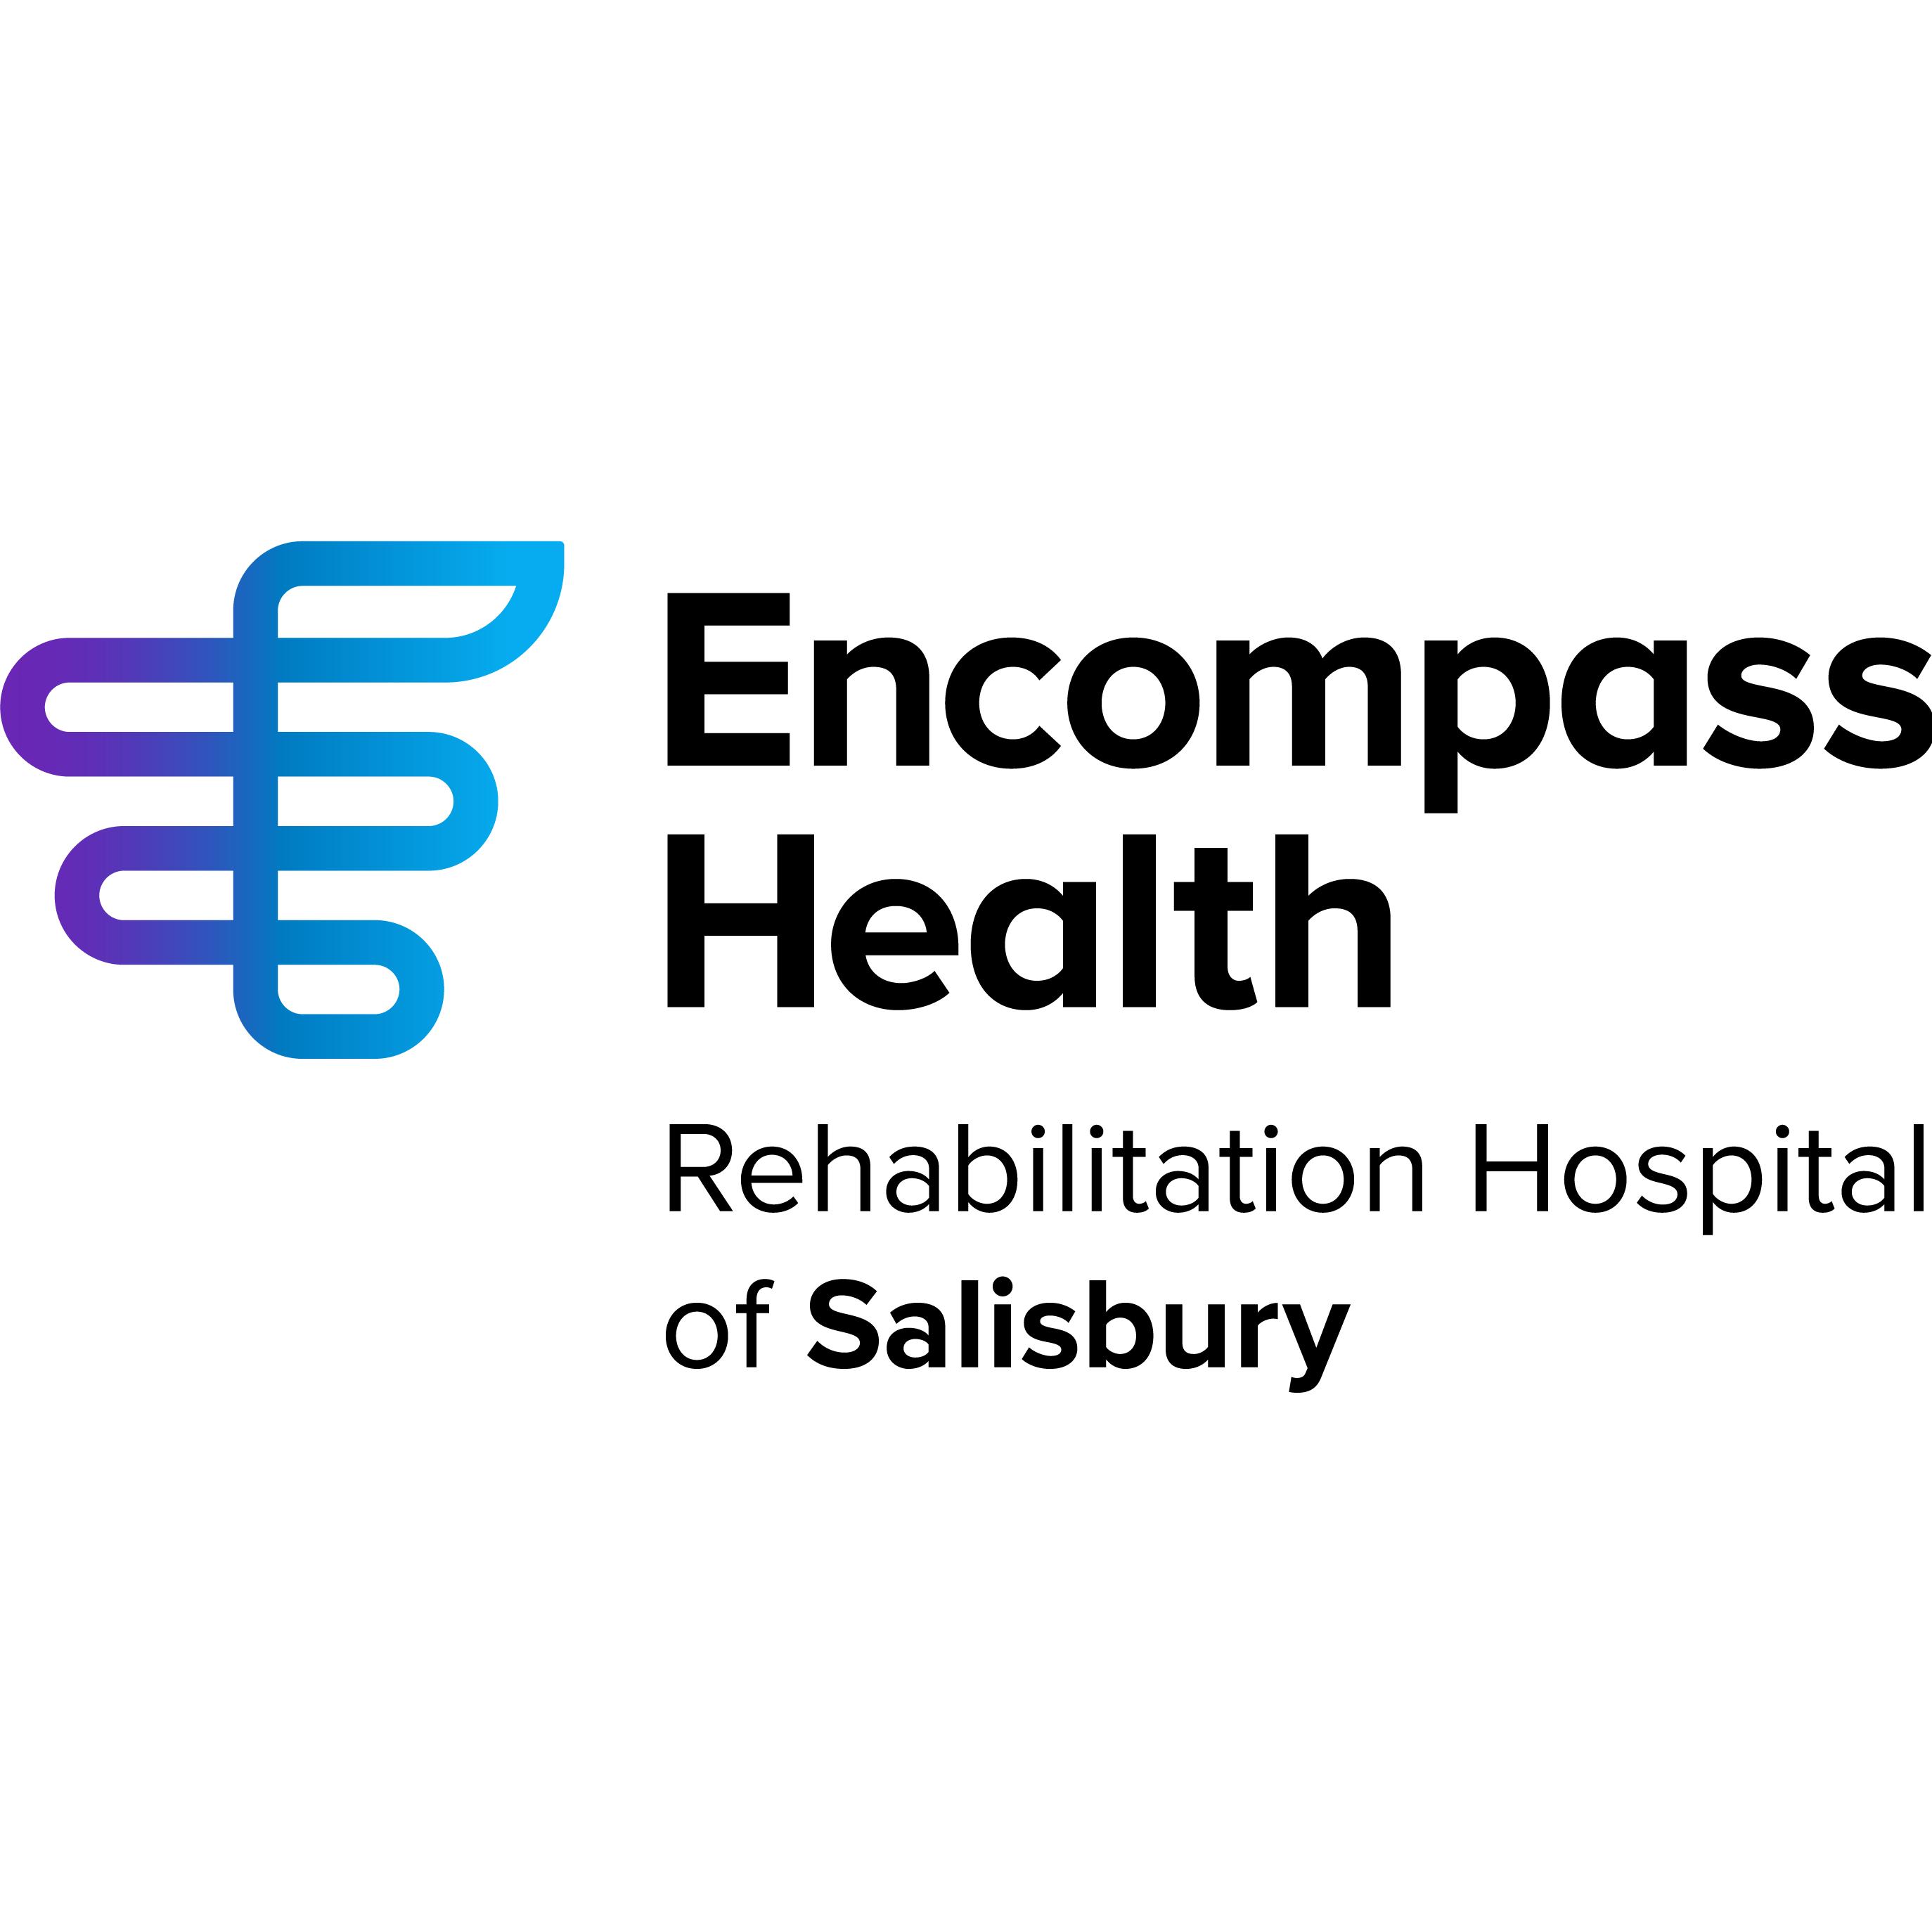 Encompass Health Rehabilitation Hospital of Salisbury